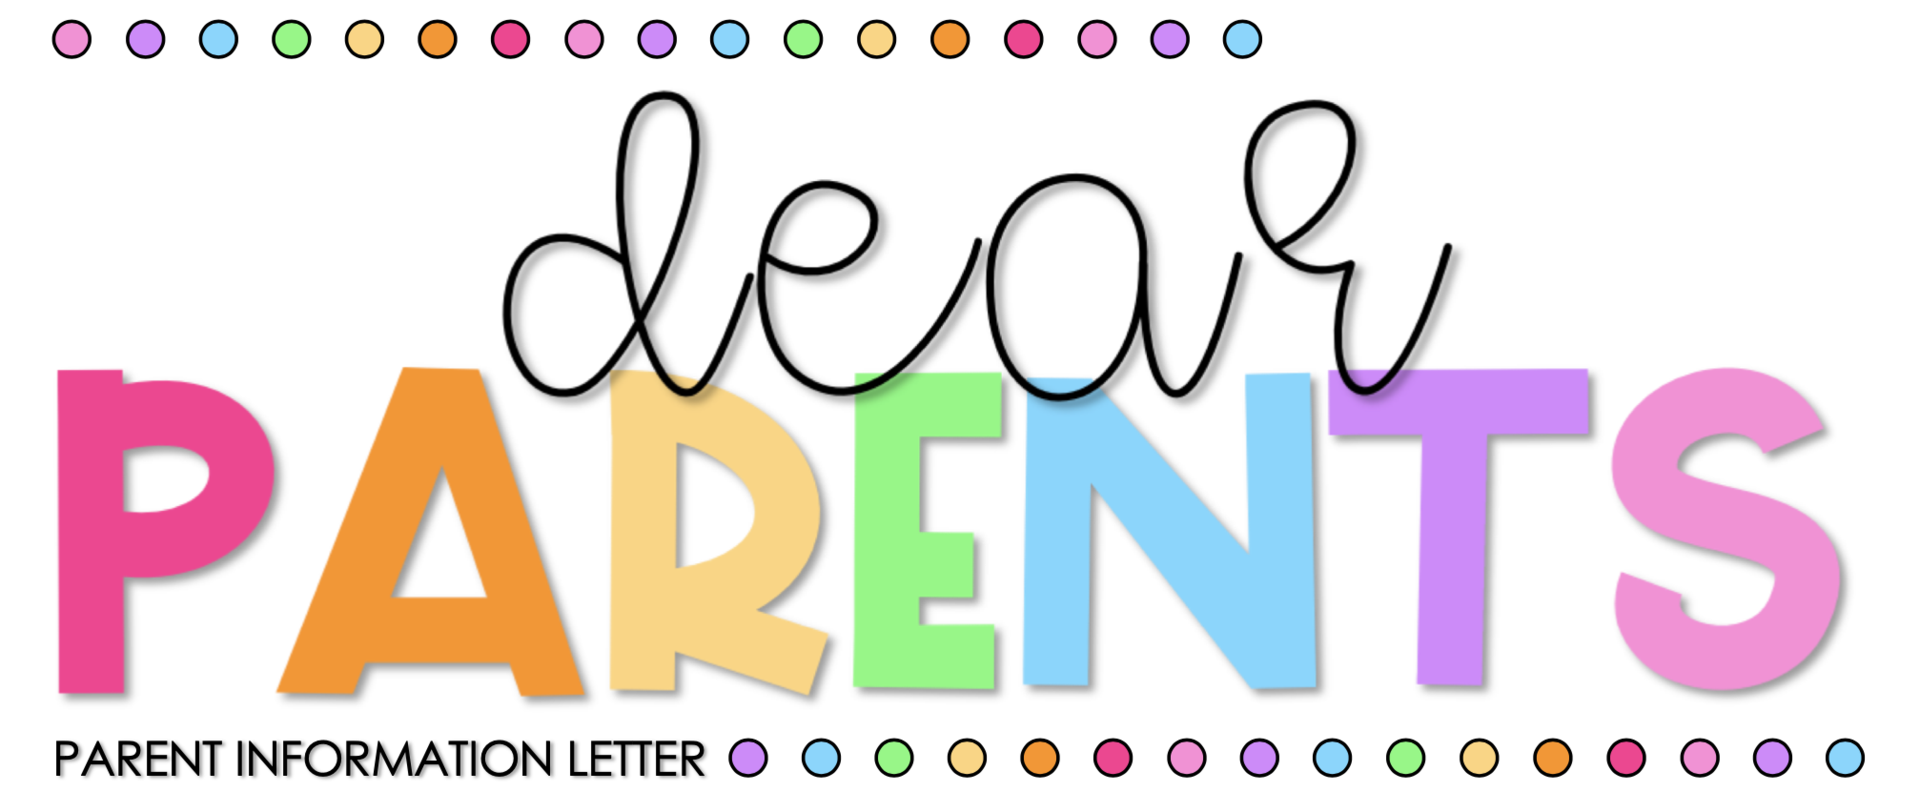 Dear Caregivers